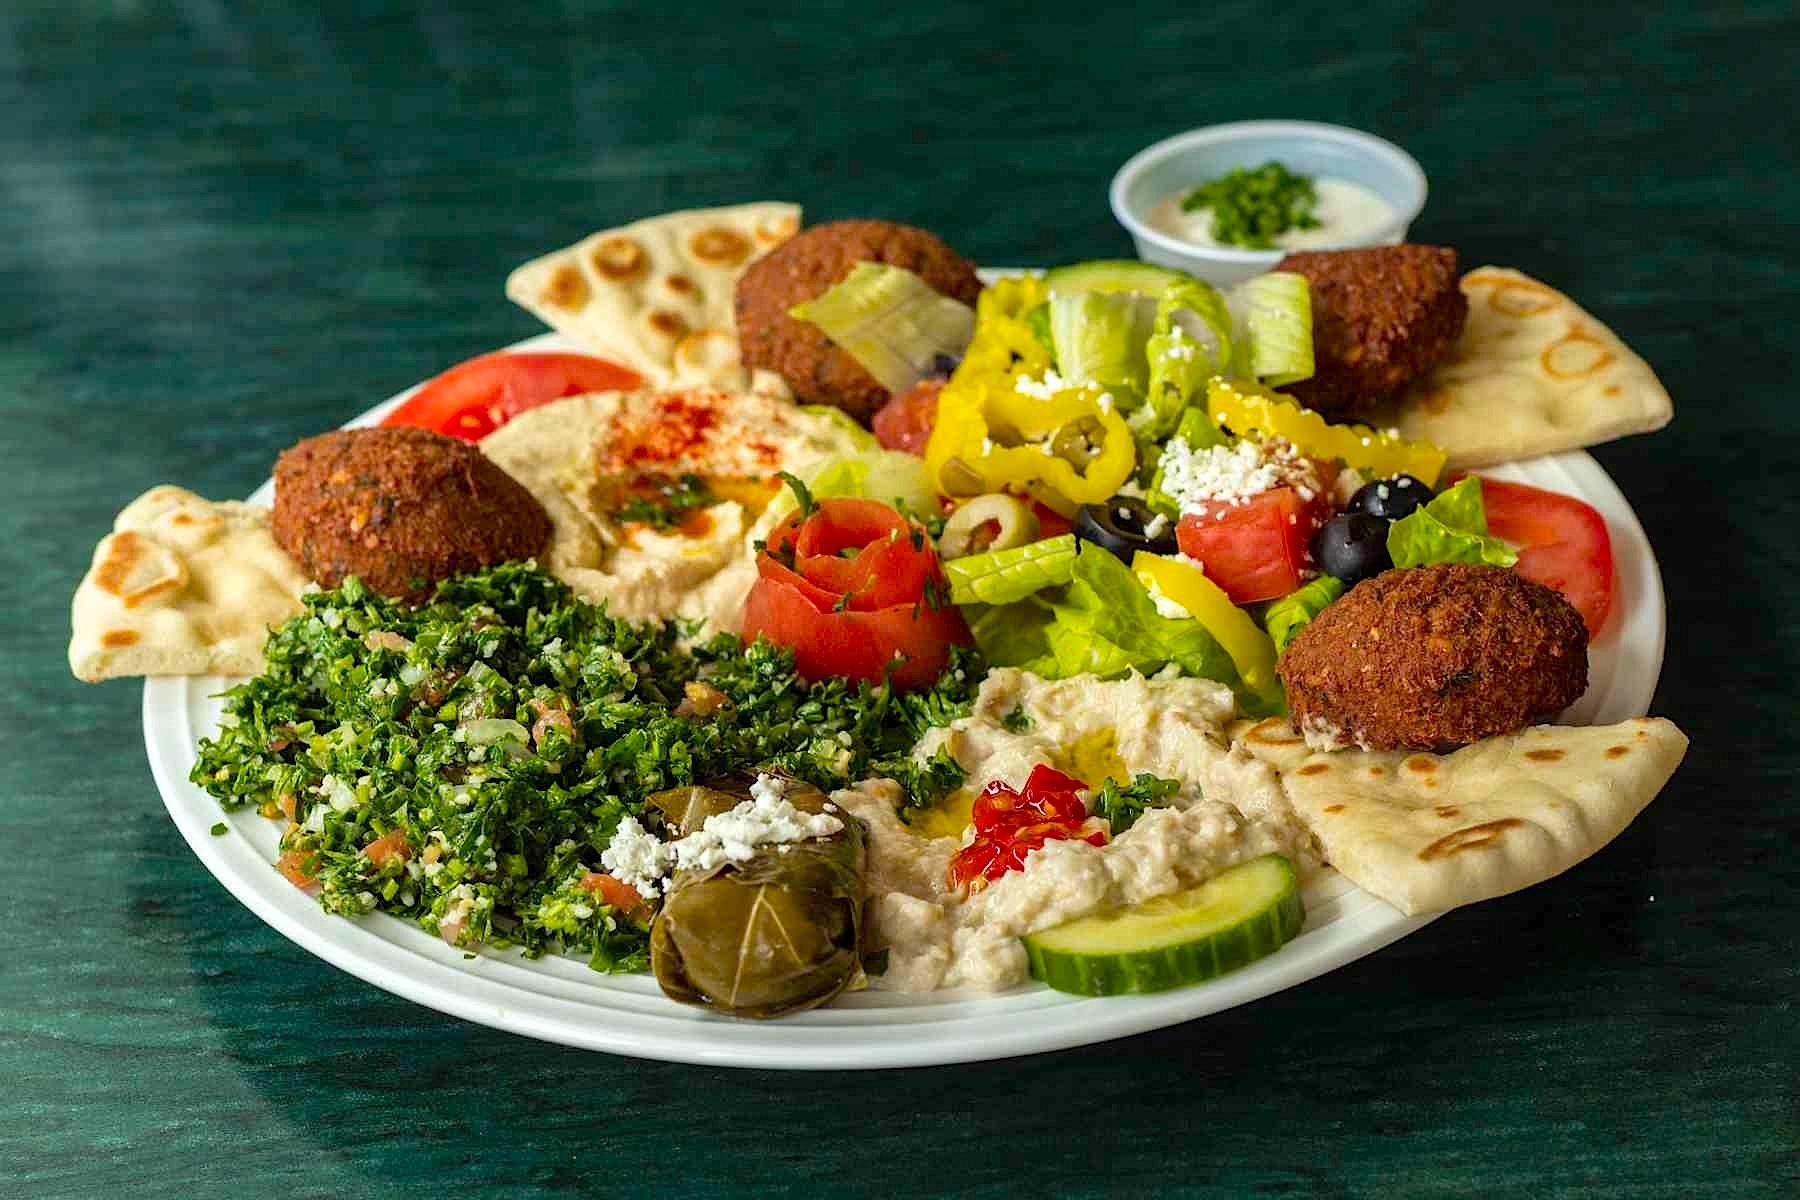 Vegetarian Platter - $10.99